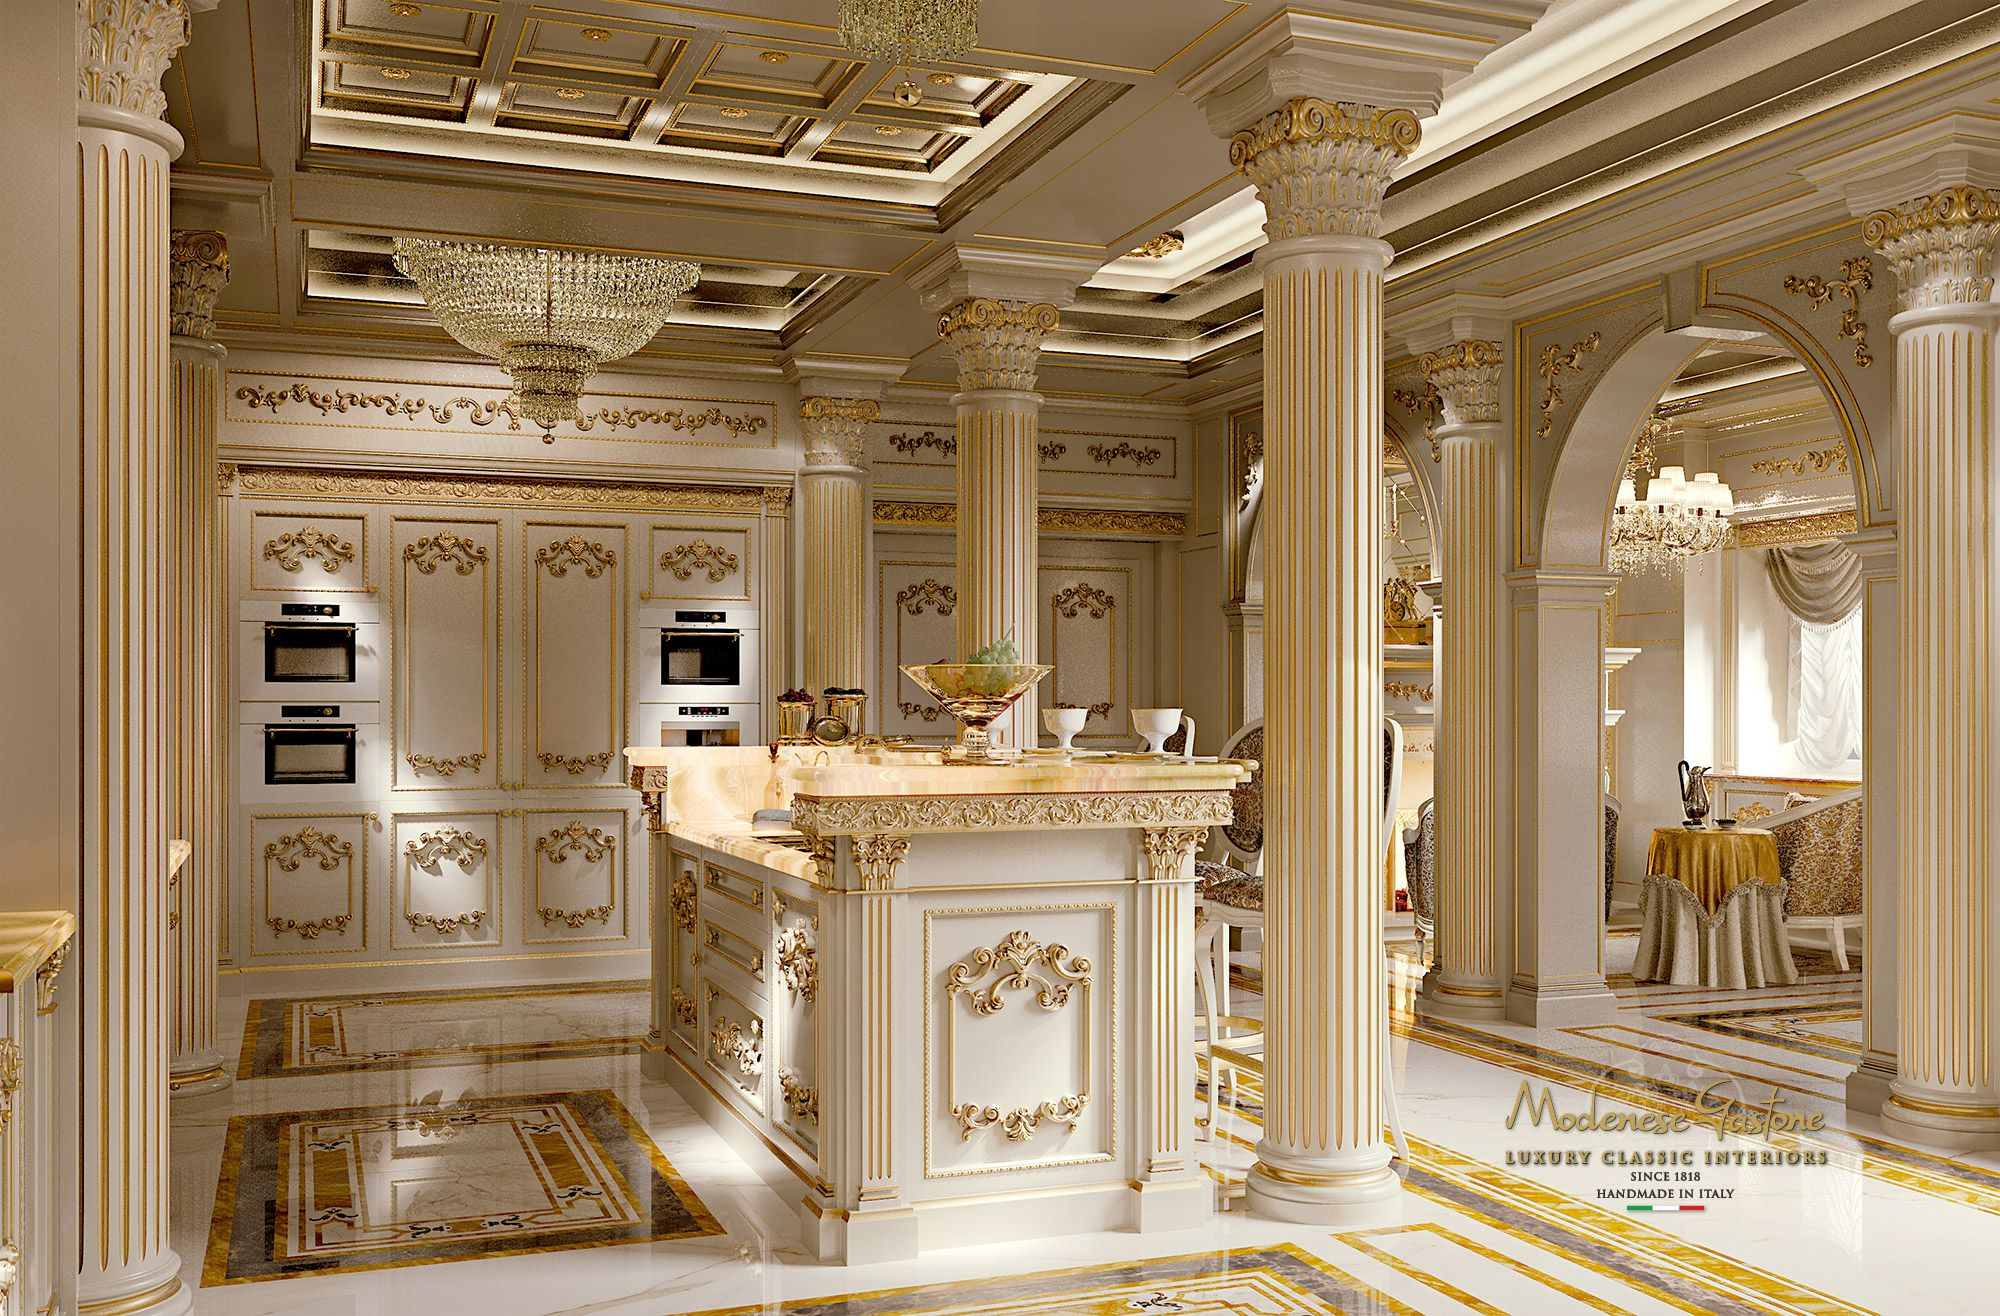 whiteandgold the kitchen royal modenese gastone http amzn to 2kevow4 con immagini on kitchen interior luxury id=46357